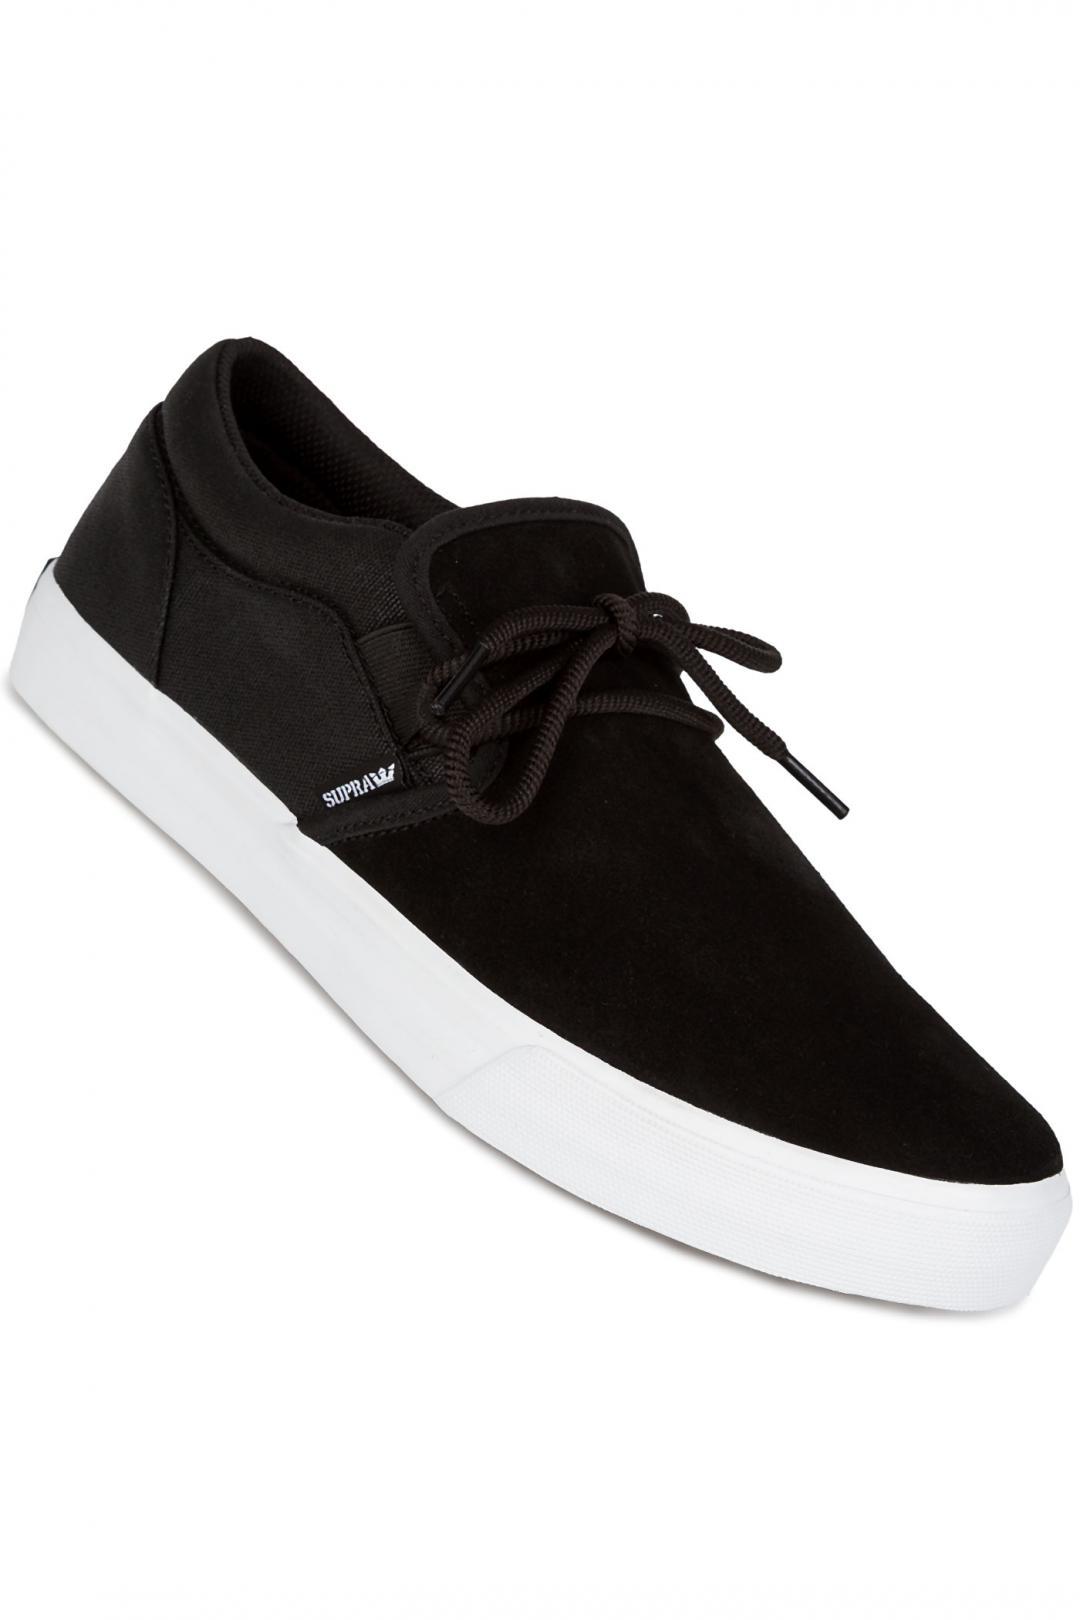 Uomo Supra Cuba black white | Sneakers slip on